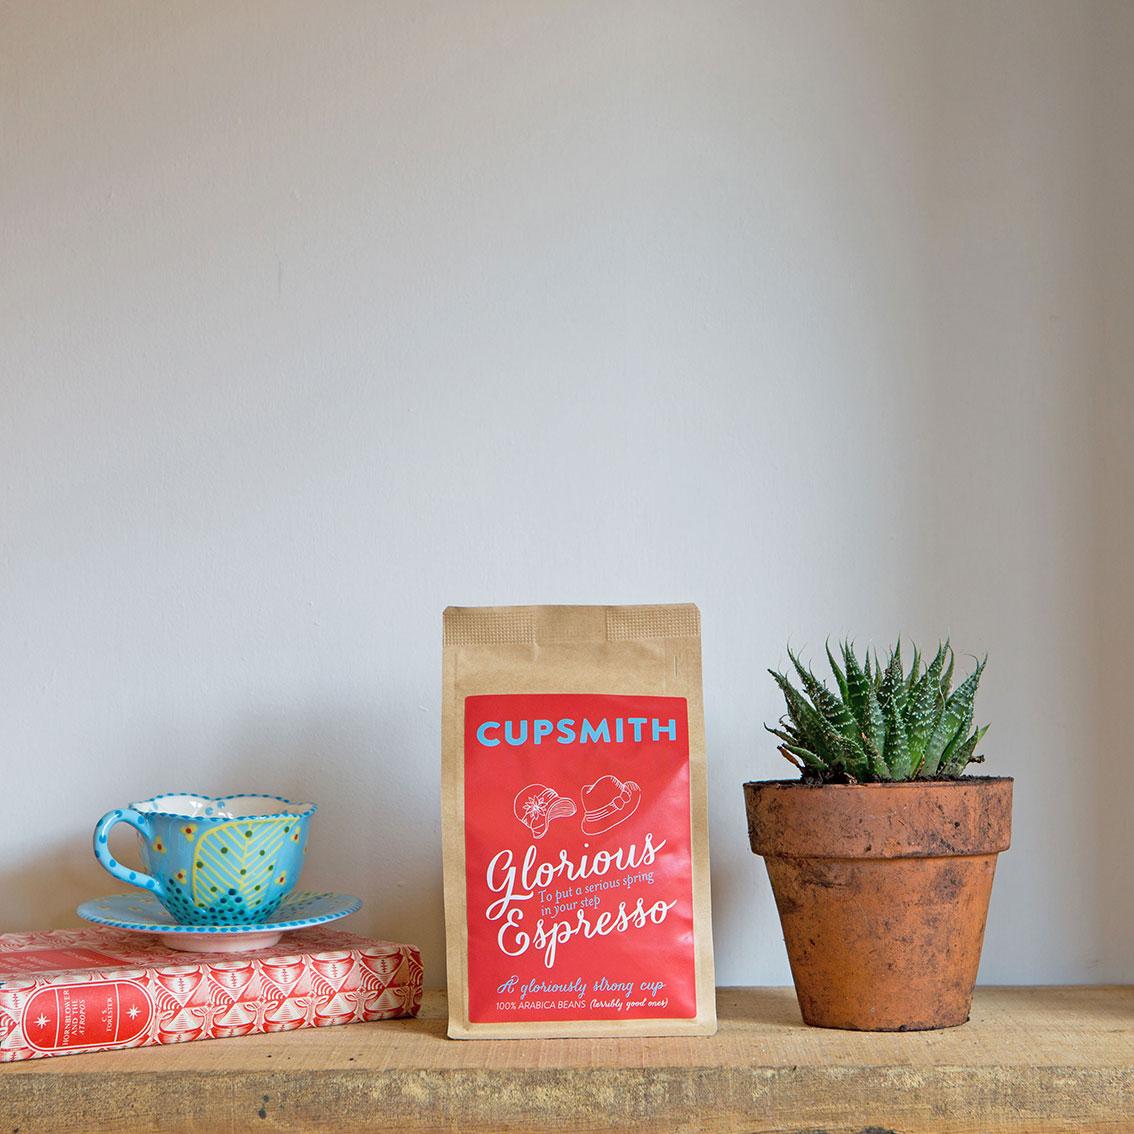 Cupsmith espresso coffee product shot